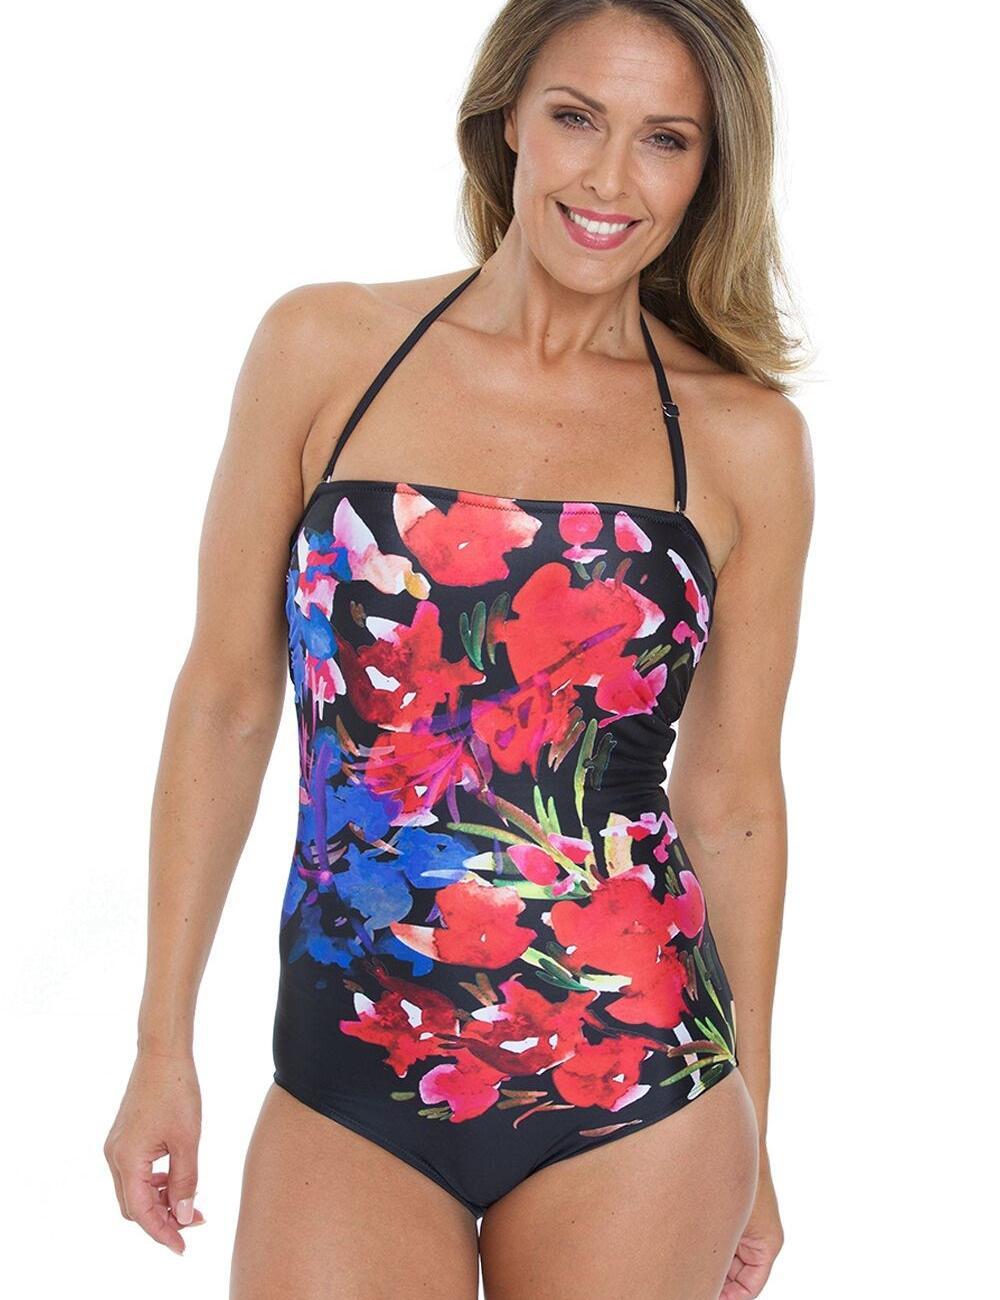 16-2340 SeaSpray Rio Bandeau Swimsuit - 16-2340 Black/Multi